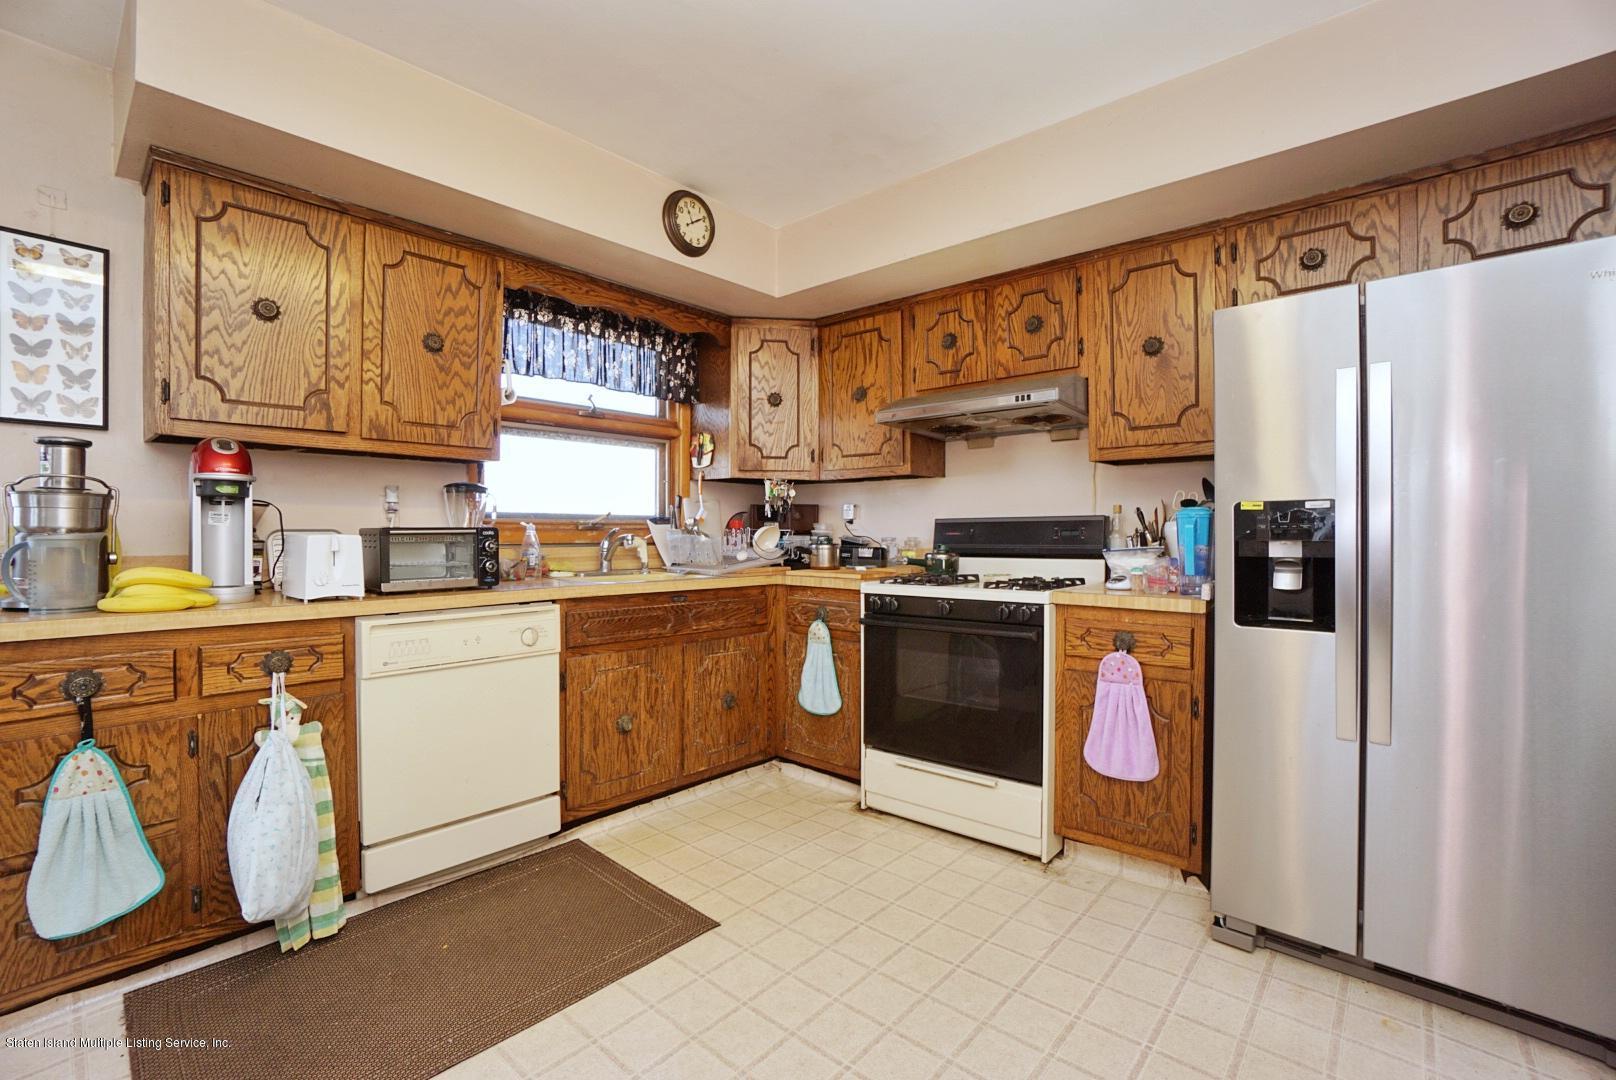 Single Family - Detached 495 Winchester Avenue  Staten Island, NY 10312, MLS-1136561-15